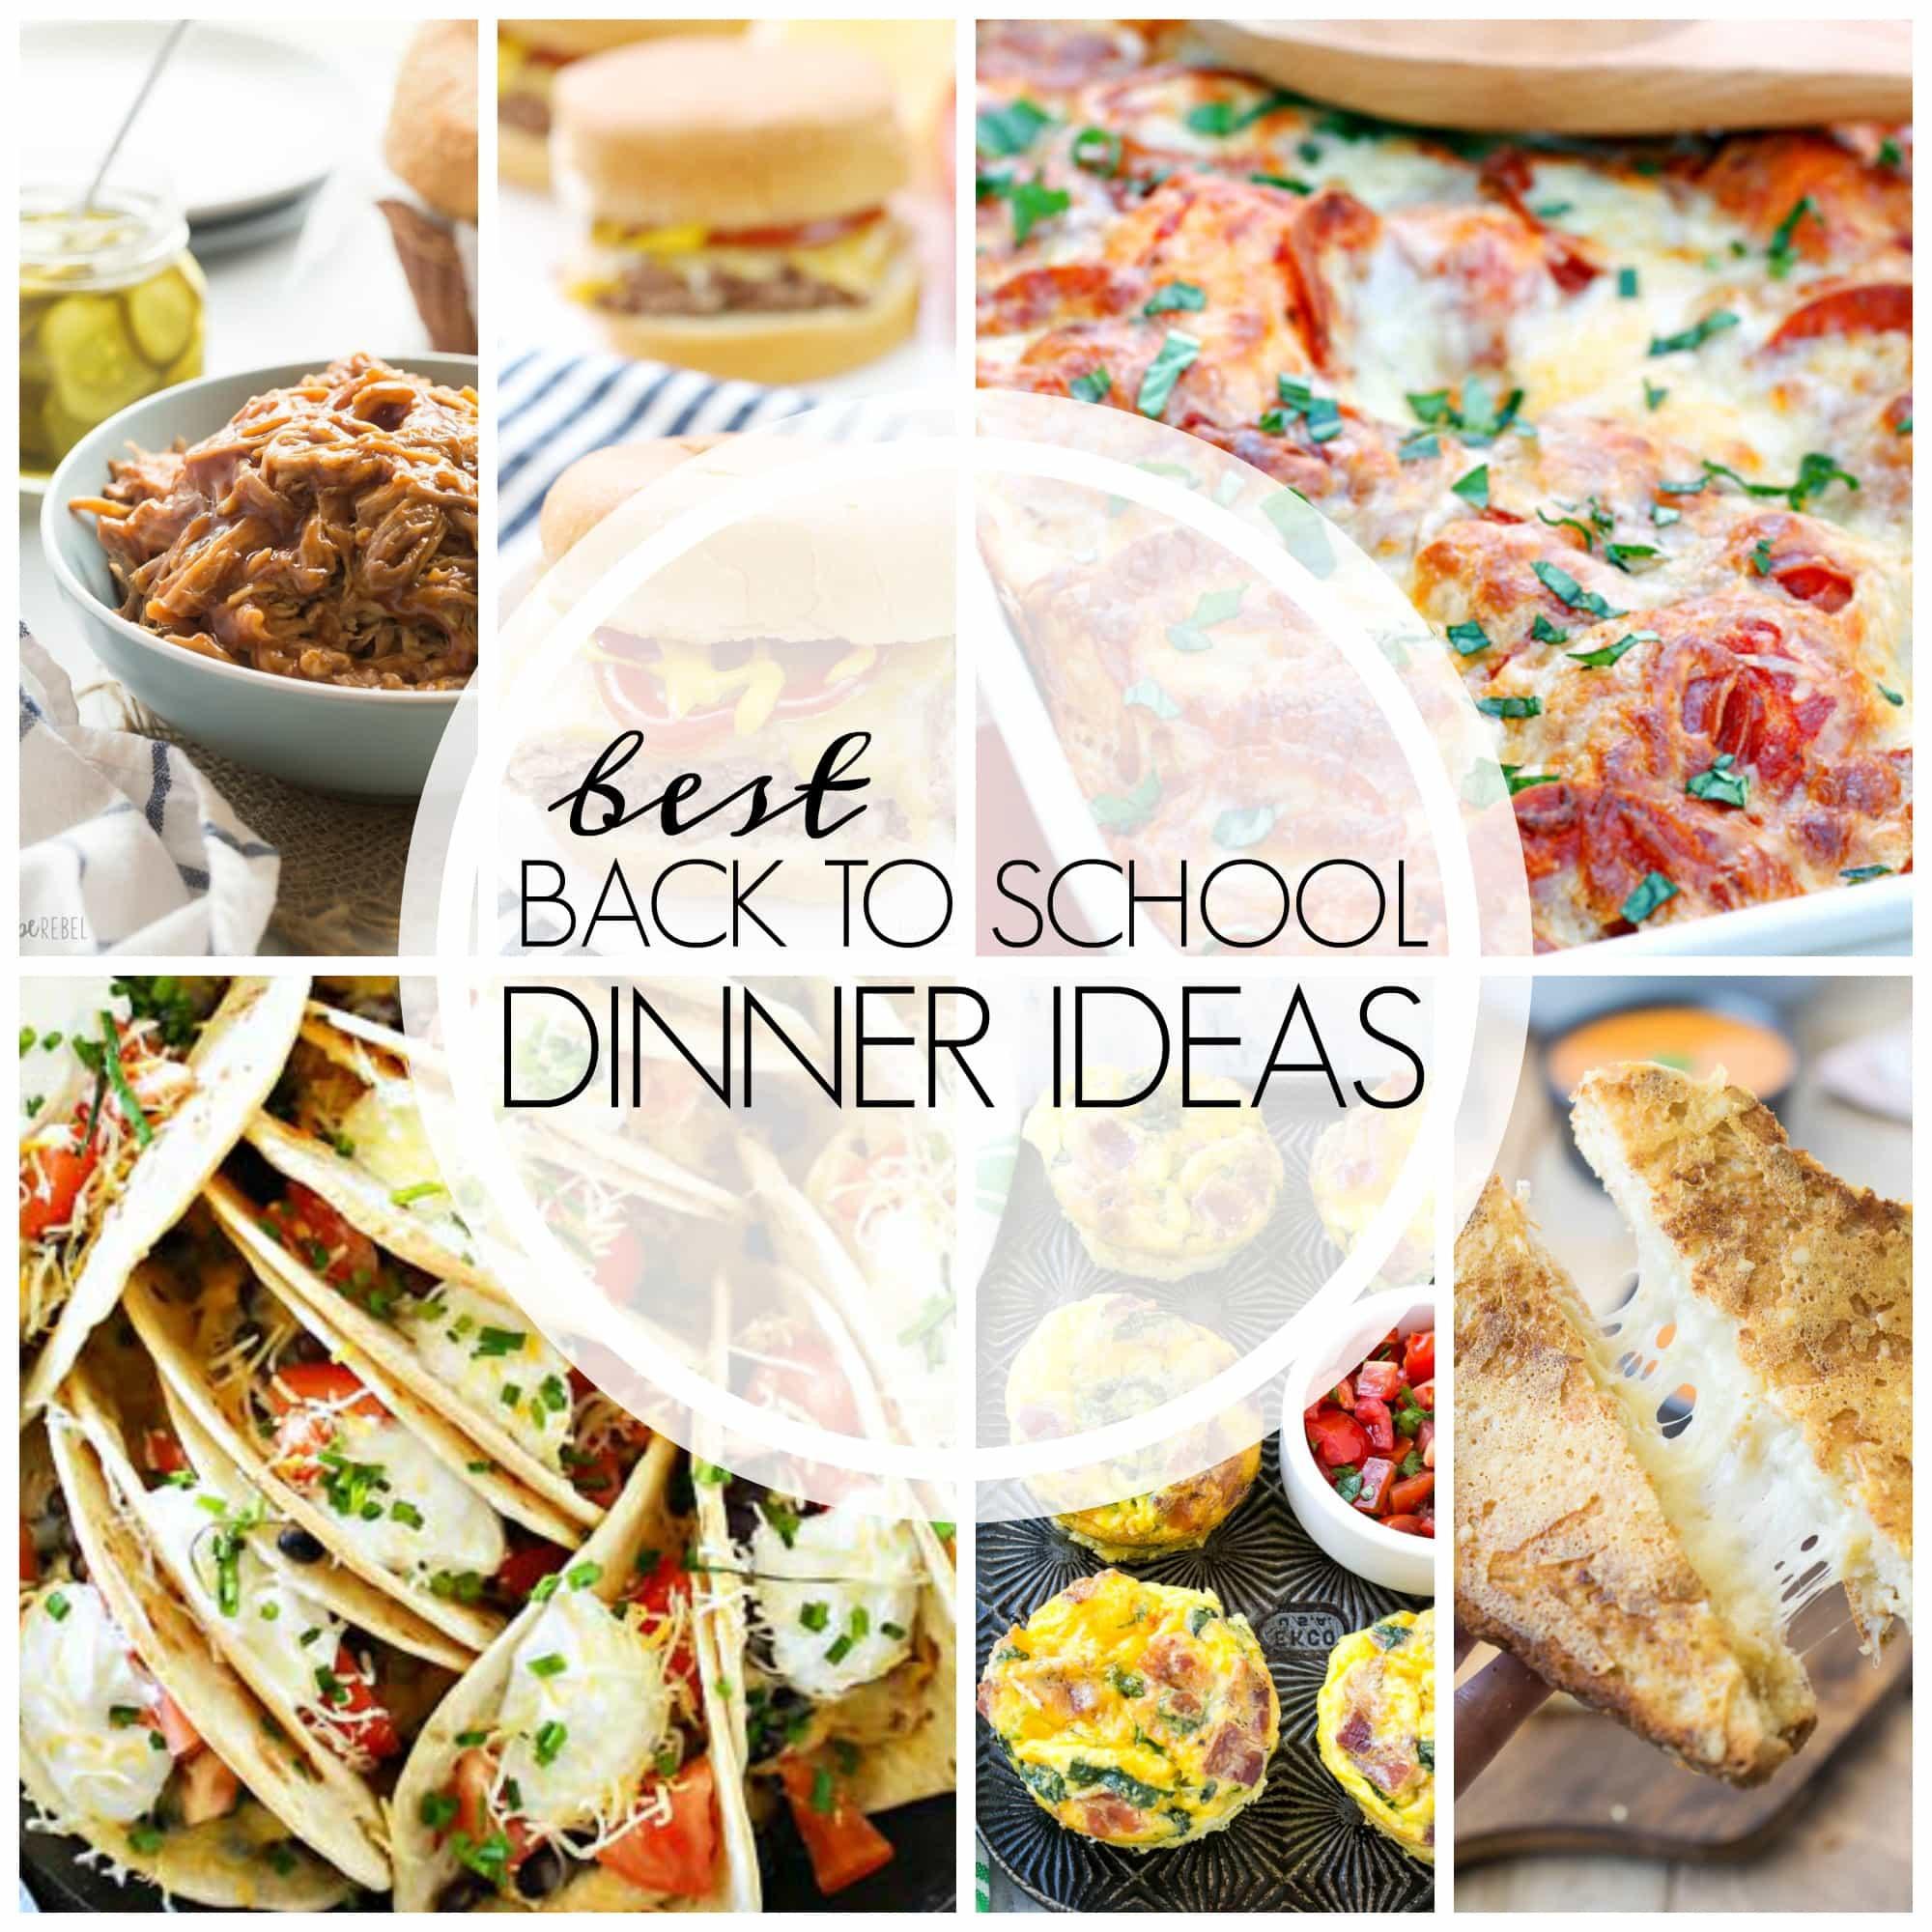 Simple Dinner Ideas  Easy Dinner Recipes 20 Family Friendly Ideas